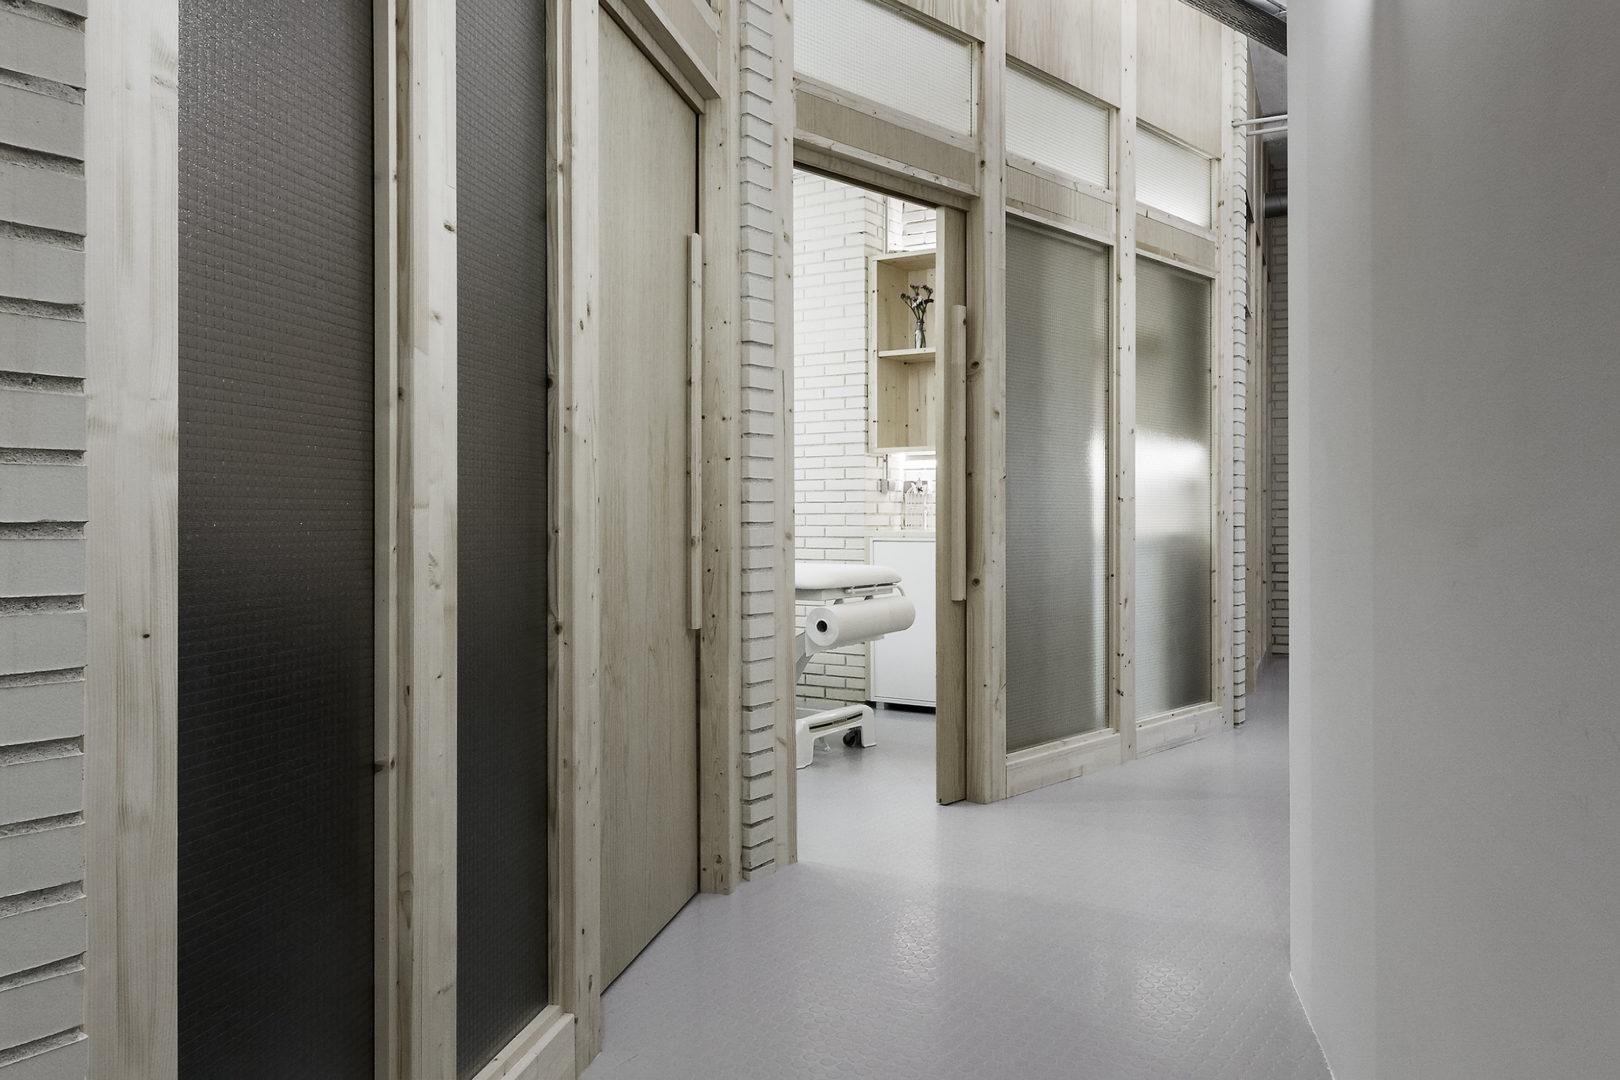 Nanarquitectos Nancontract Interiorismo Diseño Reformas Clínica Fisioterapia Sana Sana